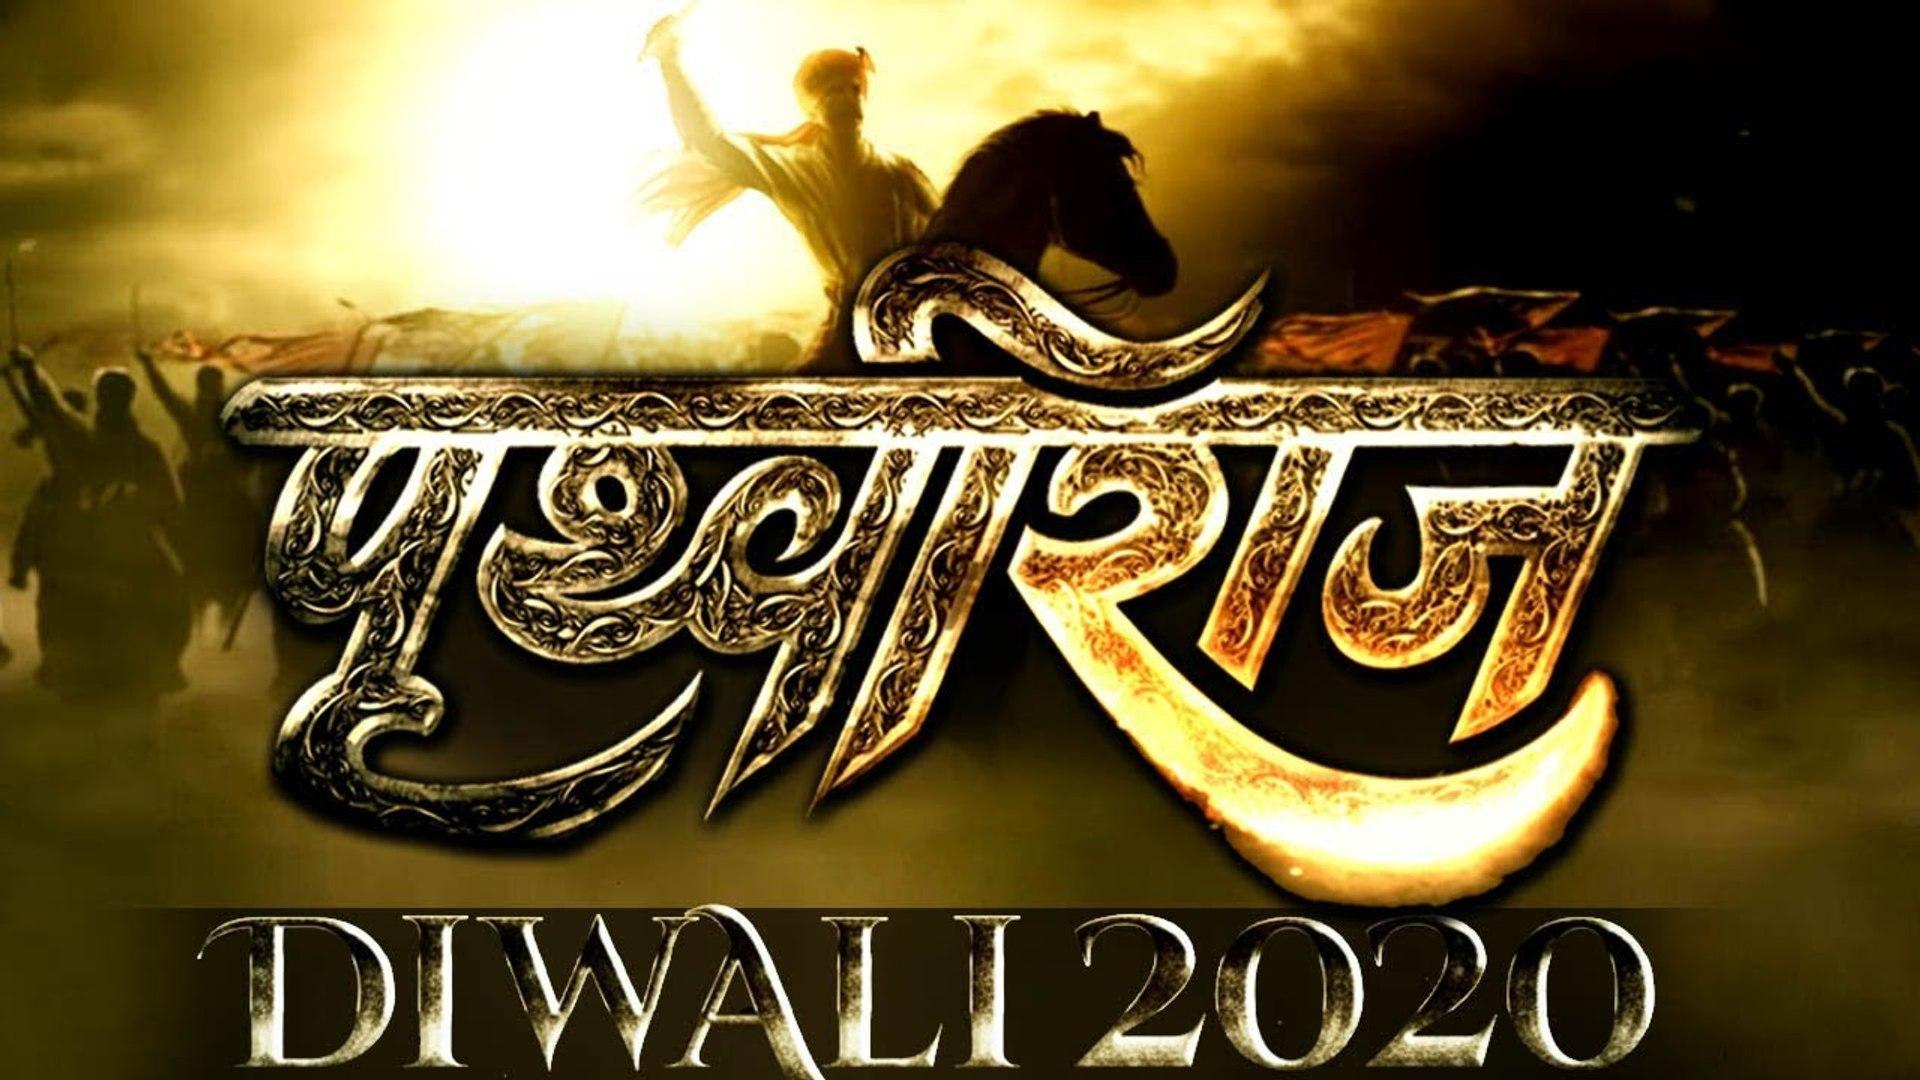 Prithviraj - Akshay's Big Announcement for Diwali 2020